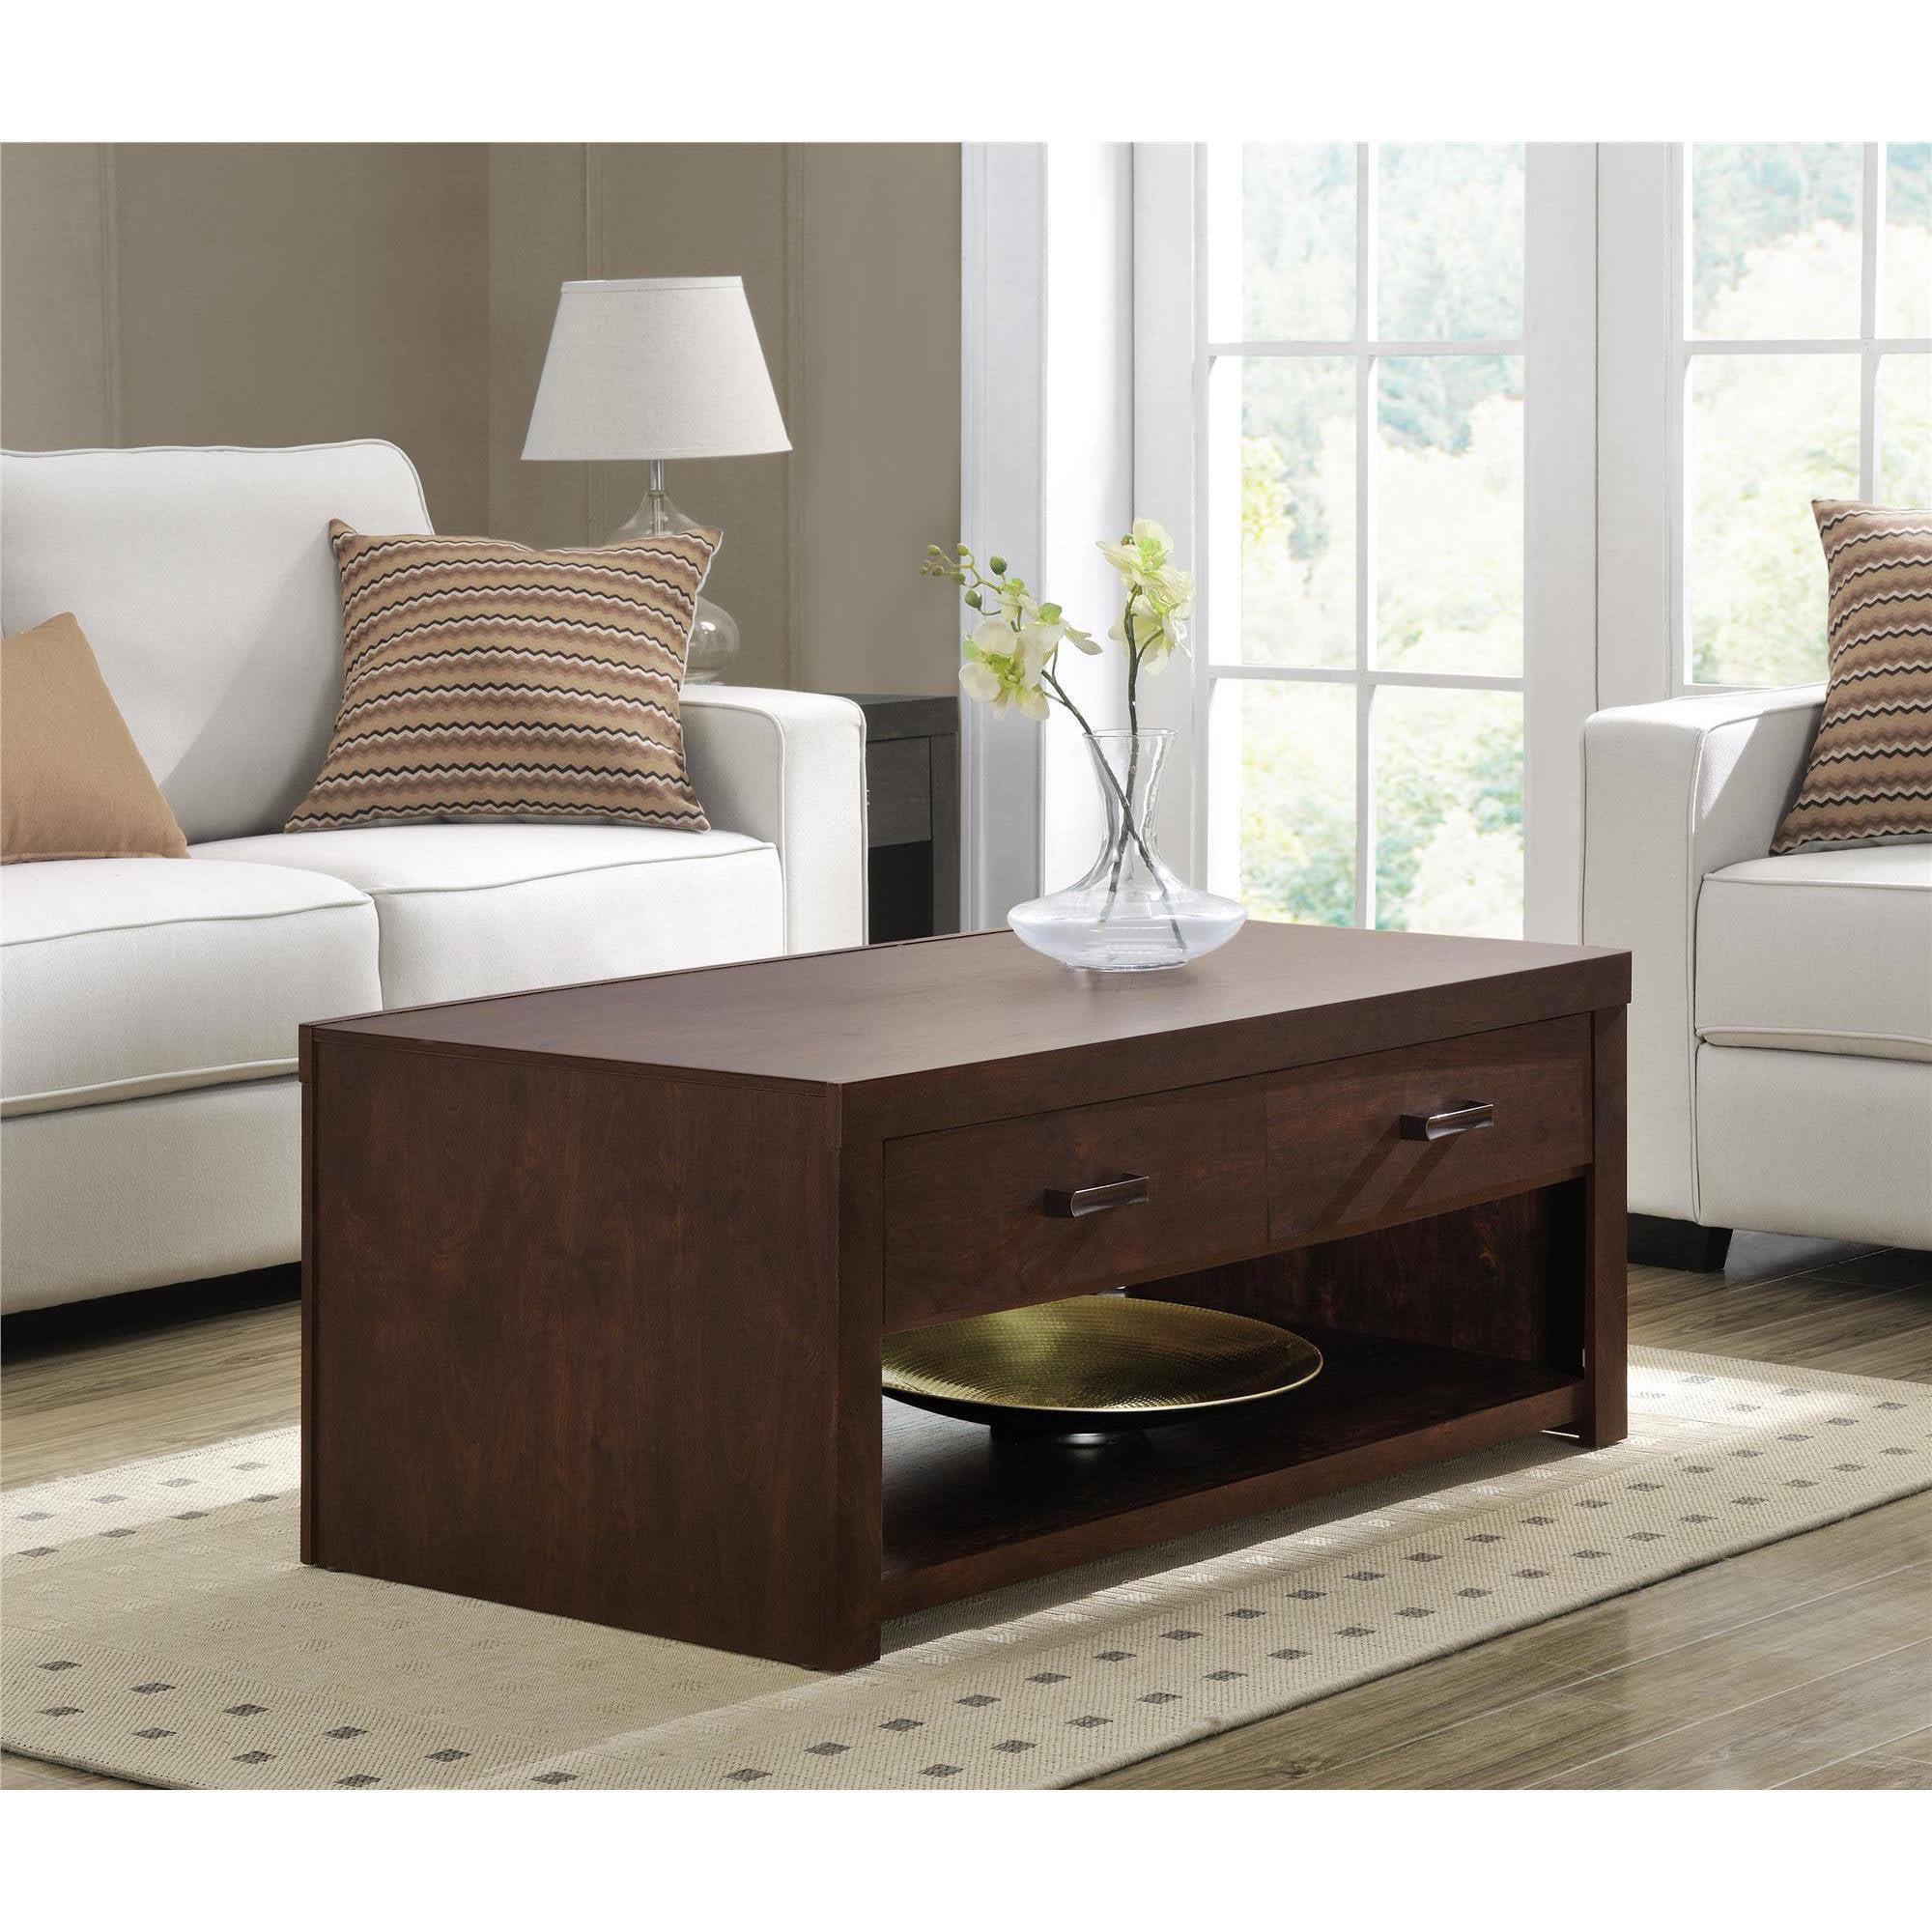 Altra Westbrook Coffee Table, Dark Walnut by Ameriwood